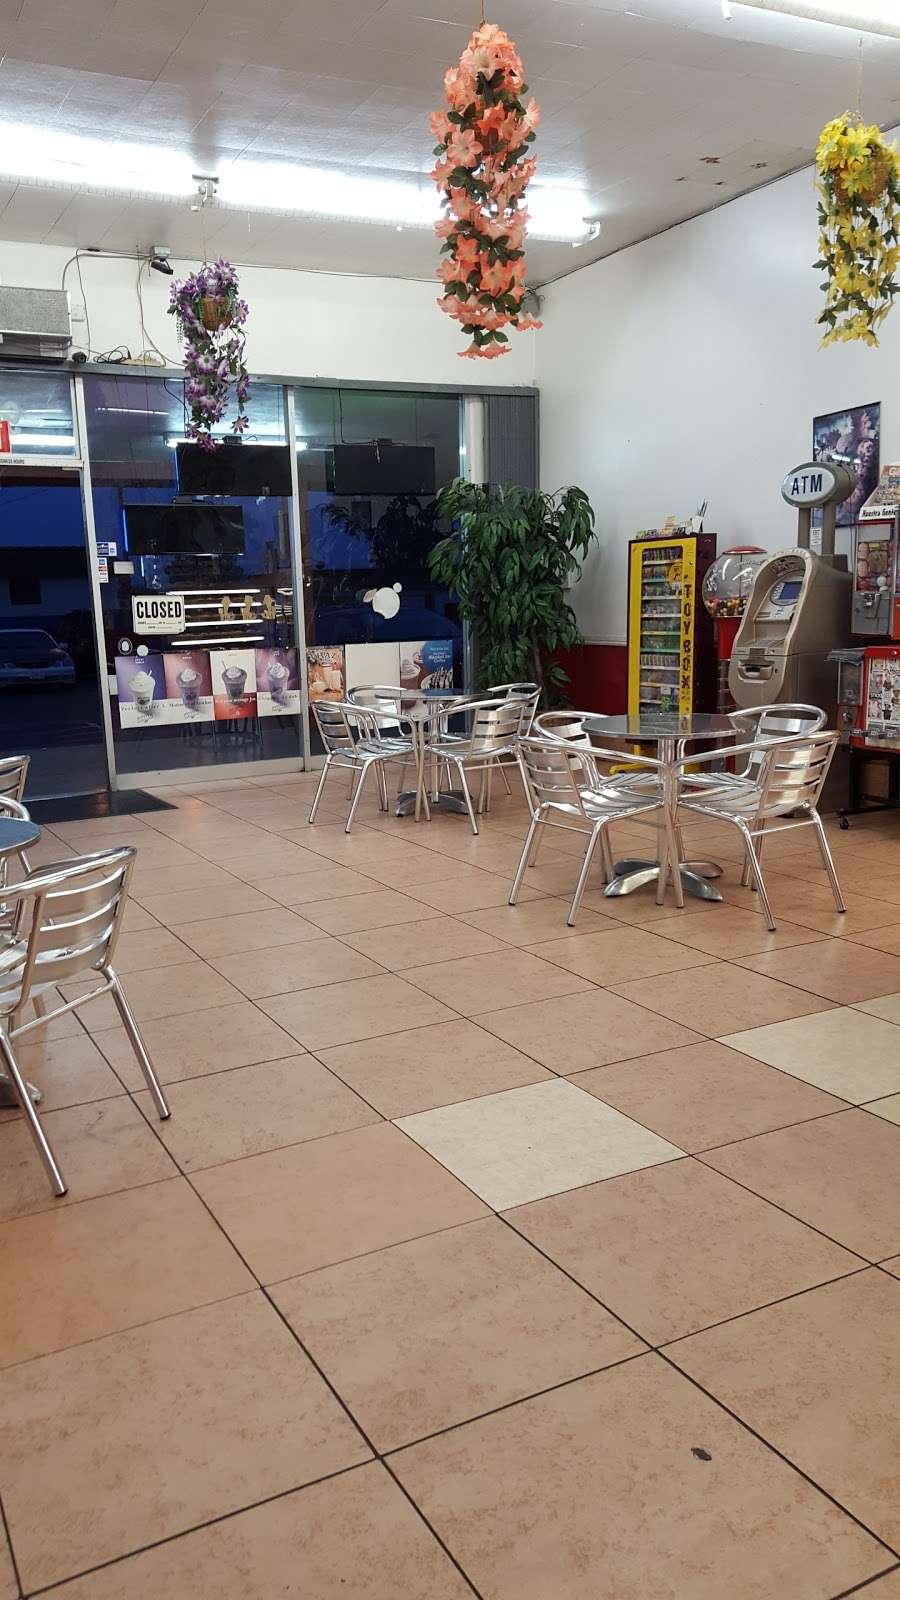 Copina Donuts - bakery  | Photo 3 of 3 | Address: 9007 Mission Boulevard, Riverside, CA 92509, USA | Phone: (951) 685-1332